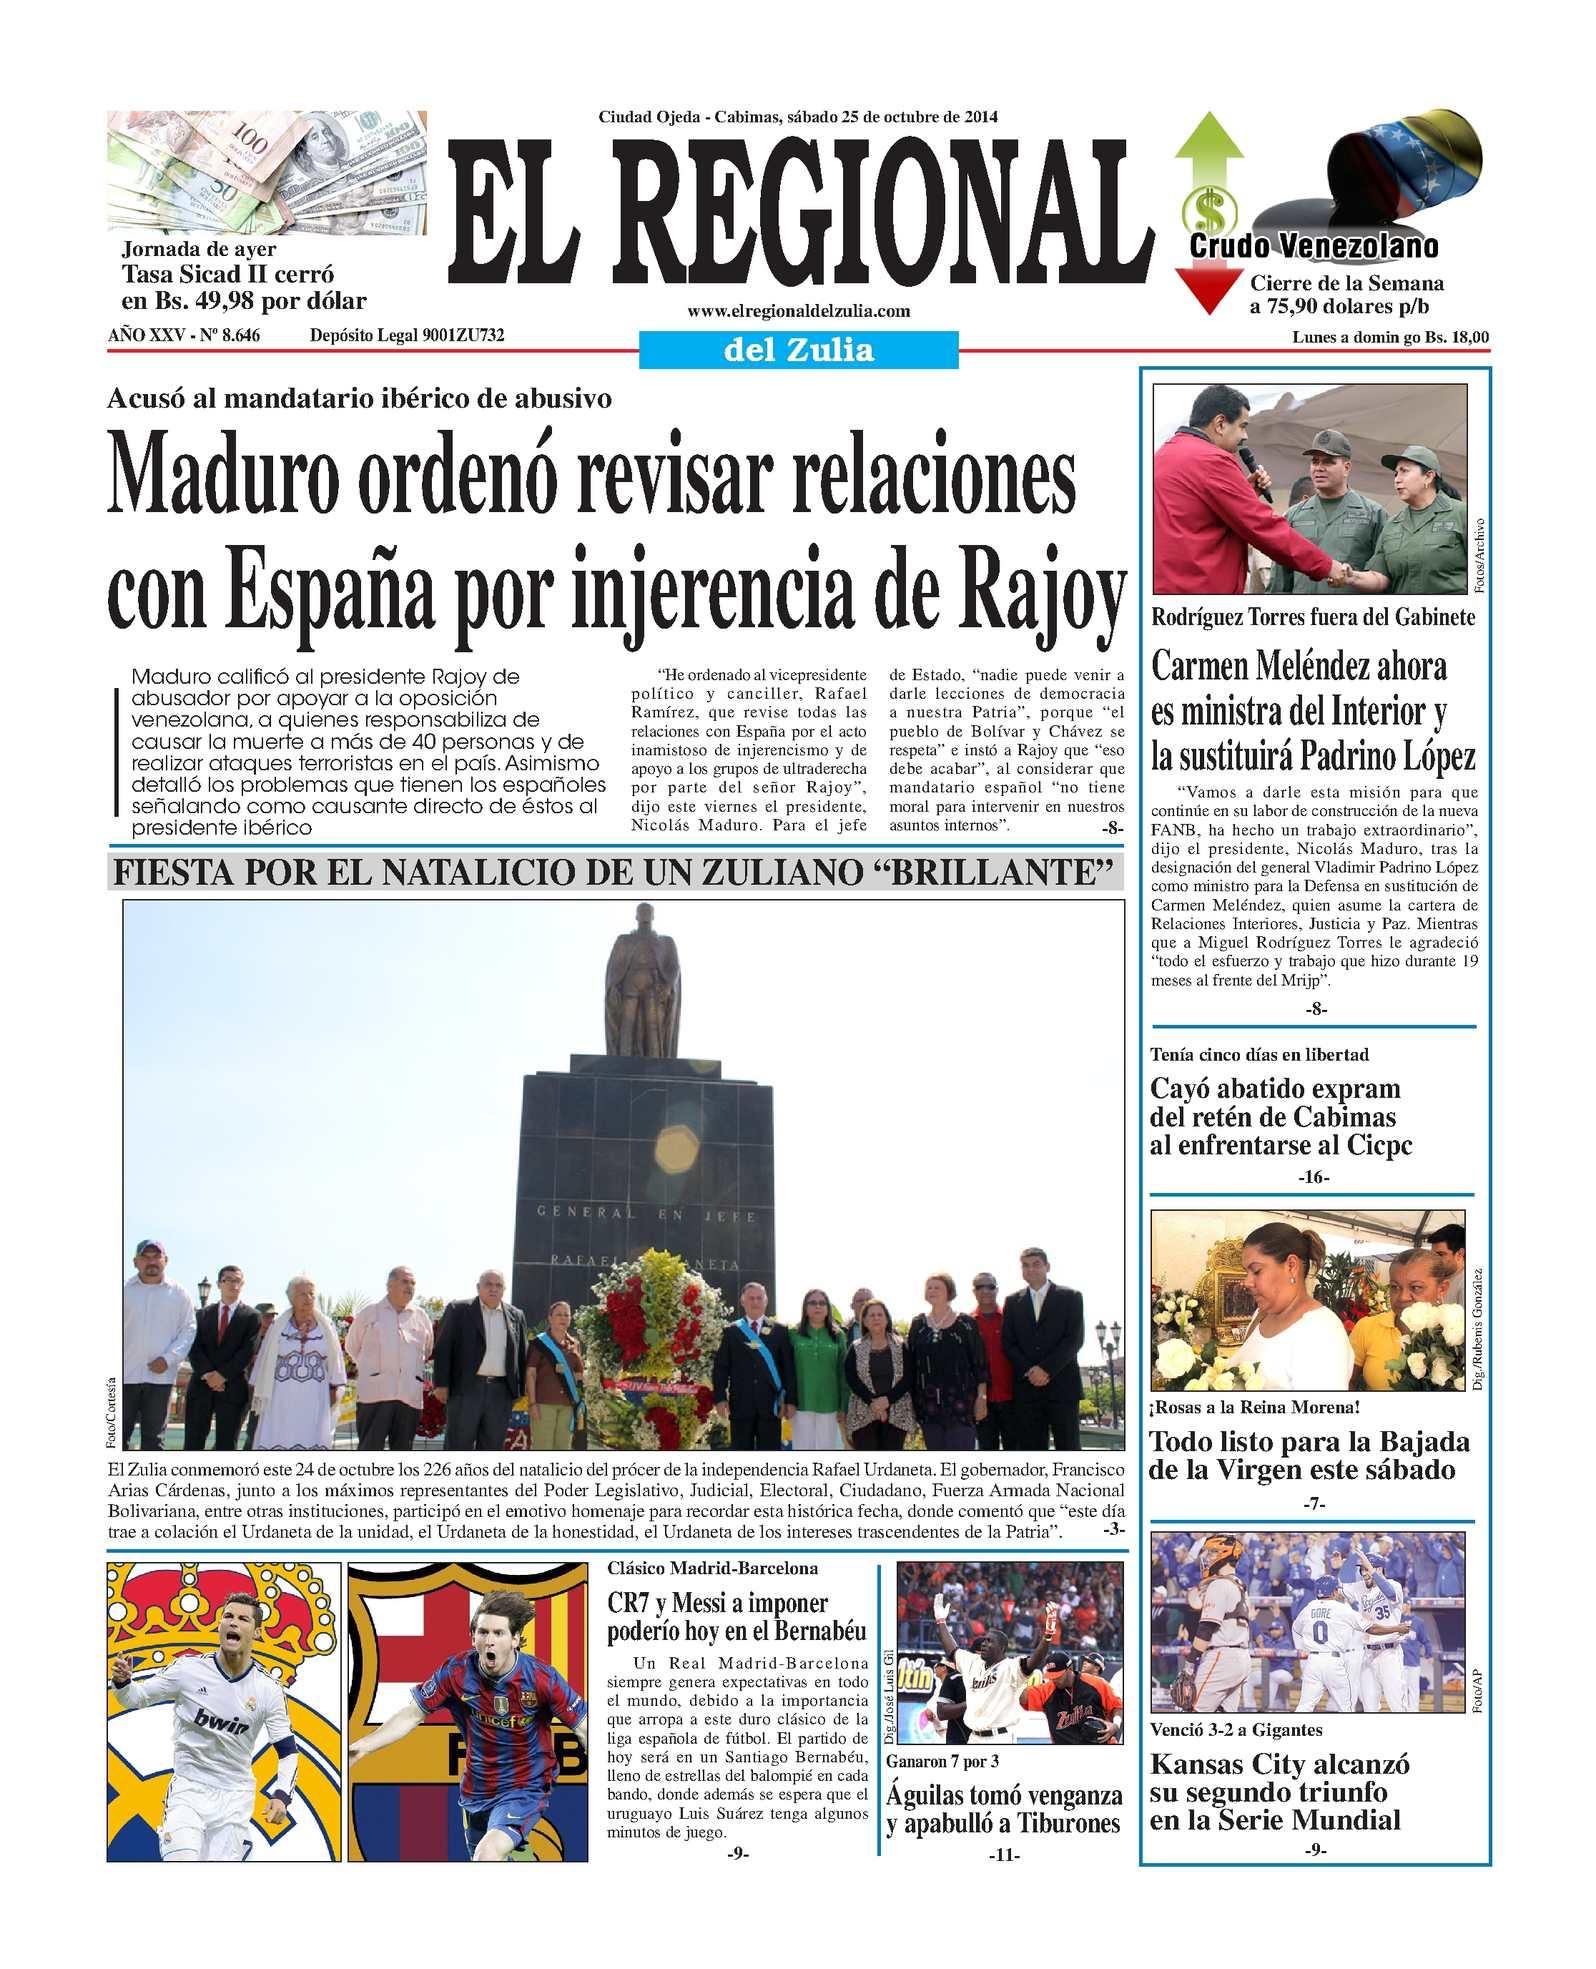 Calaméo - El Regional del Zulia 25-10-2014